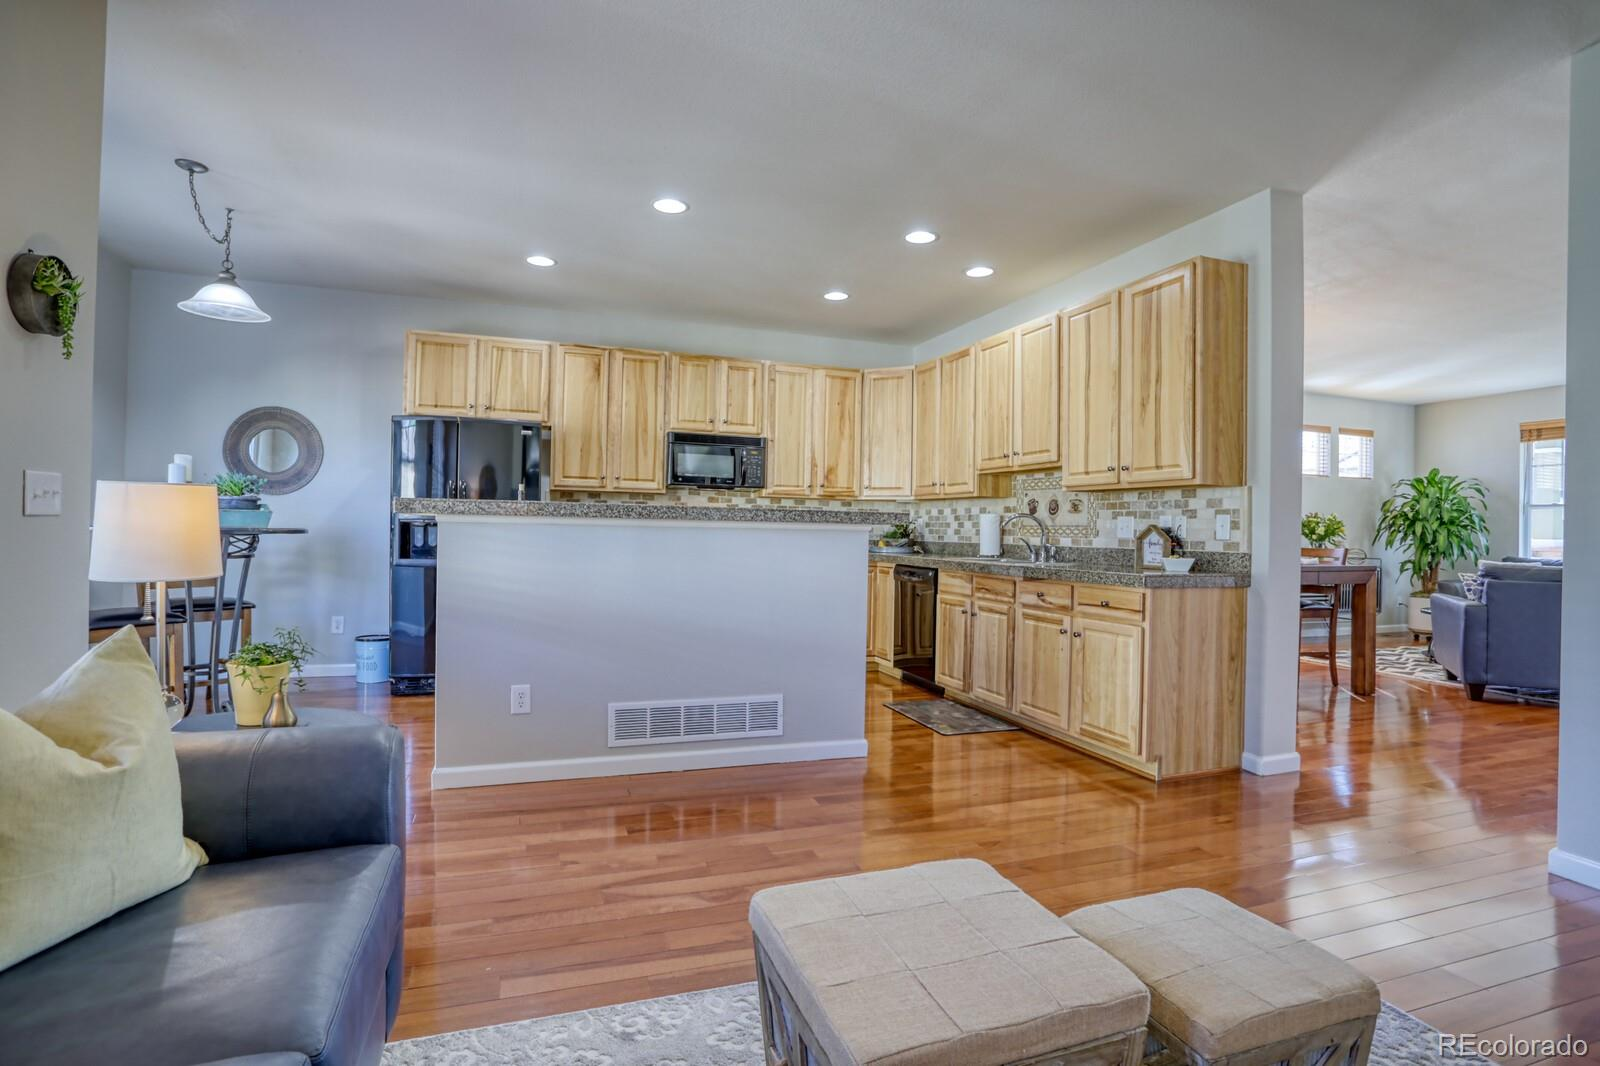 MLS# 8551789 - 11 - 22752 E Briarwood Place, Aurora, CO 80016